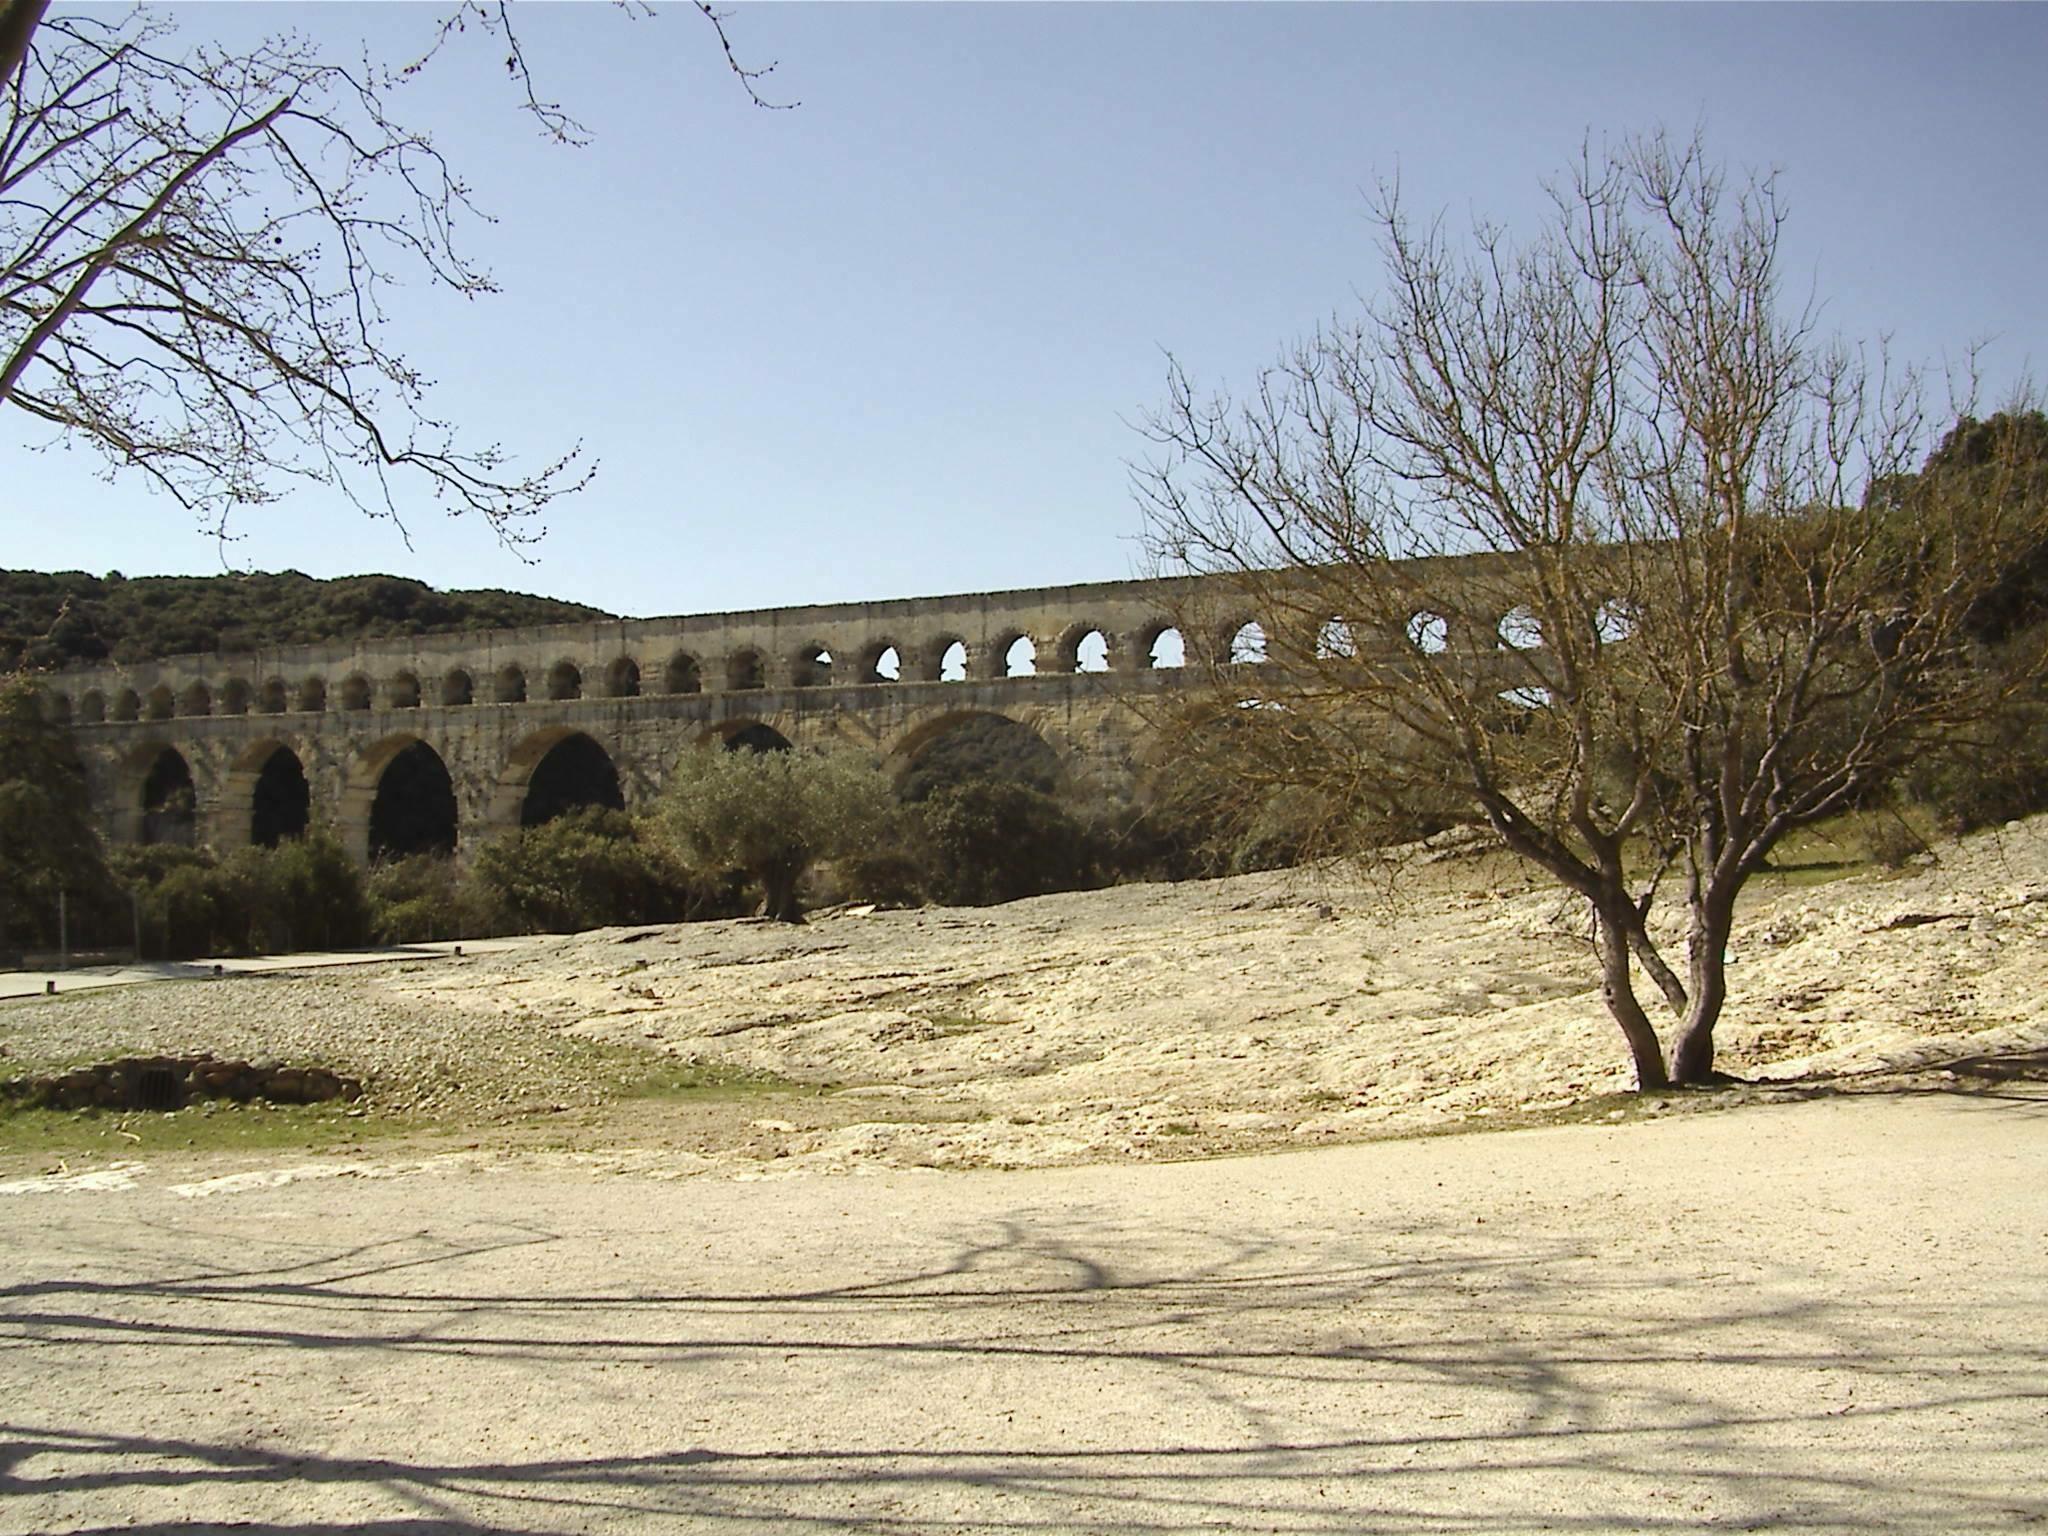 Pont du Gard (Roman Aqueduct) - France